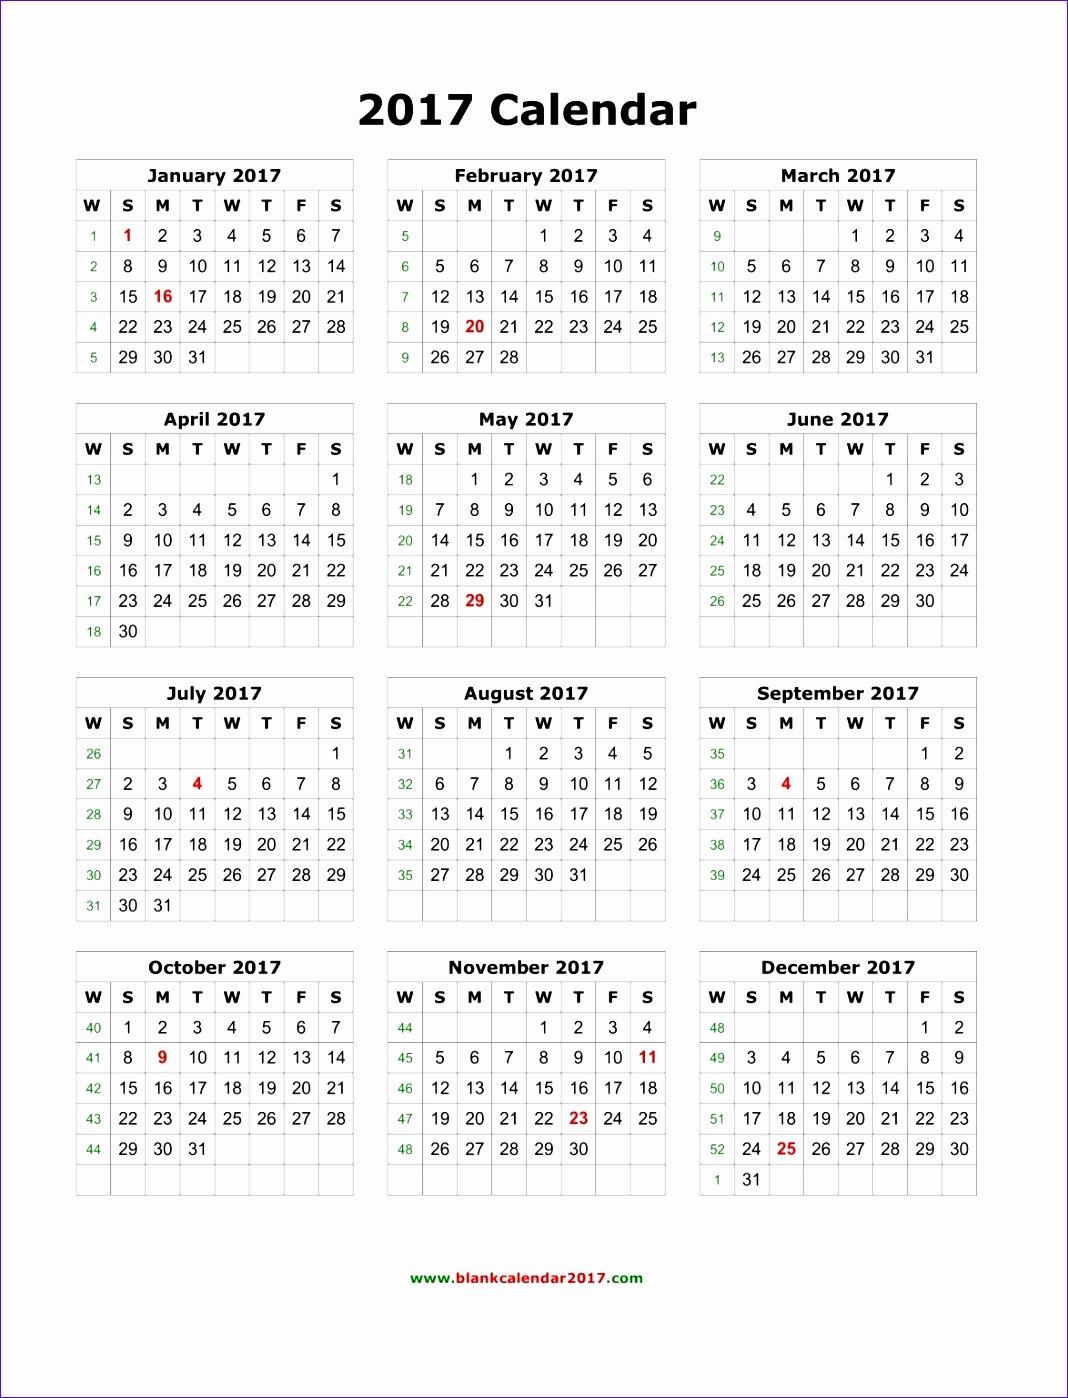 blank calendar 2017 example 17